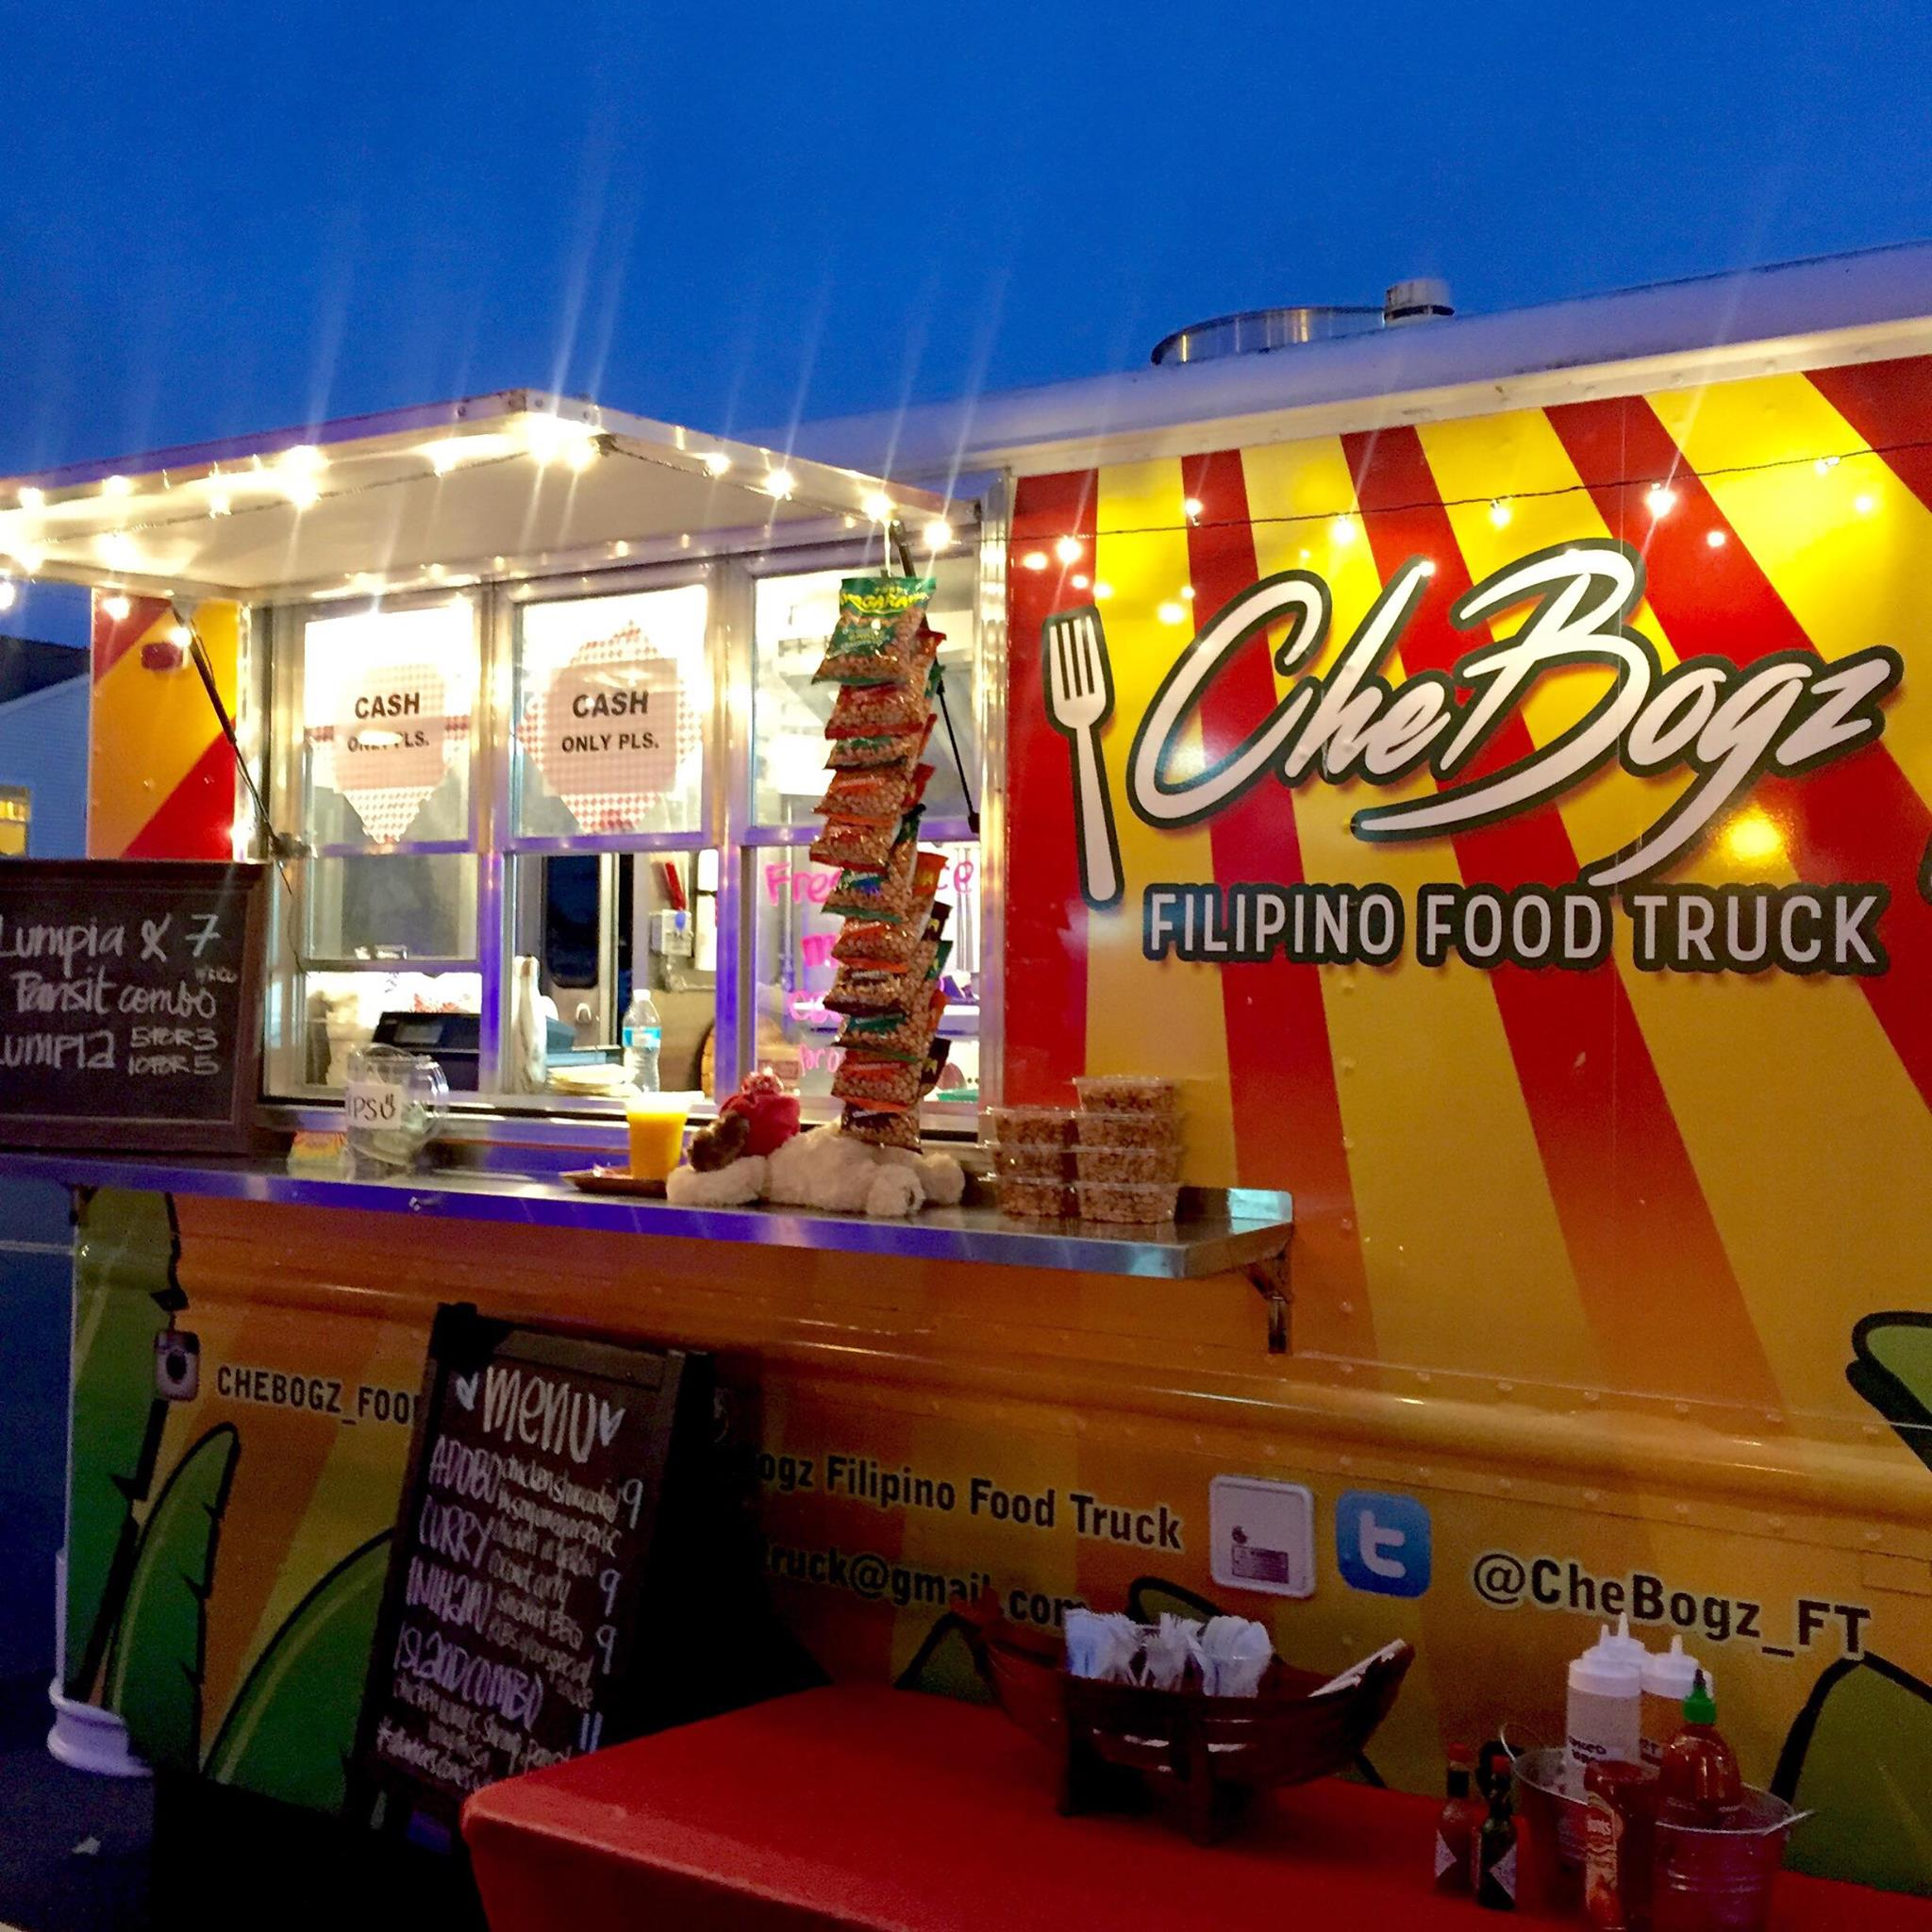 CheBogz Food Truck